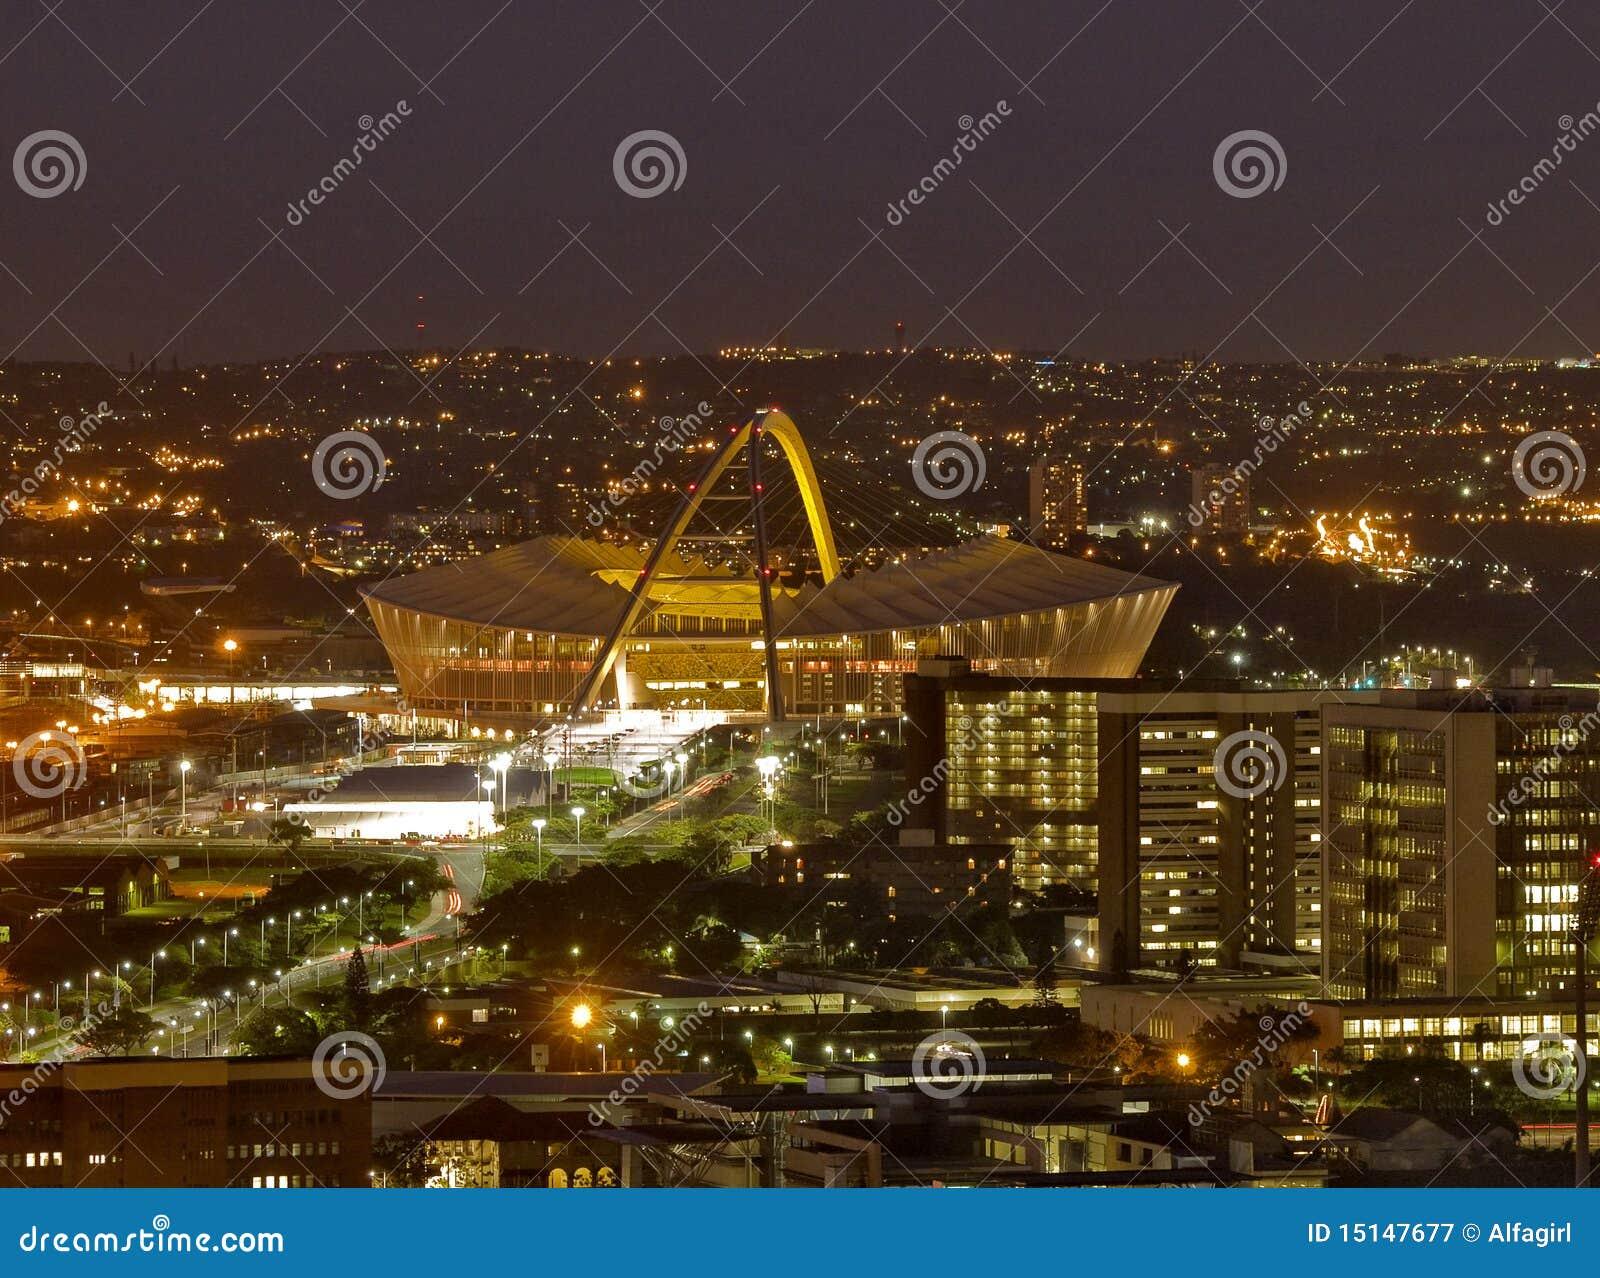 Africa Durban mabhida Moses południe stadium